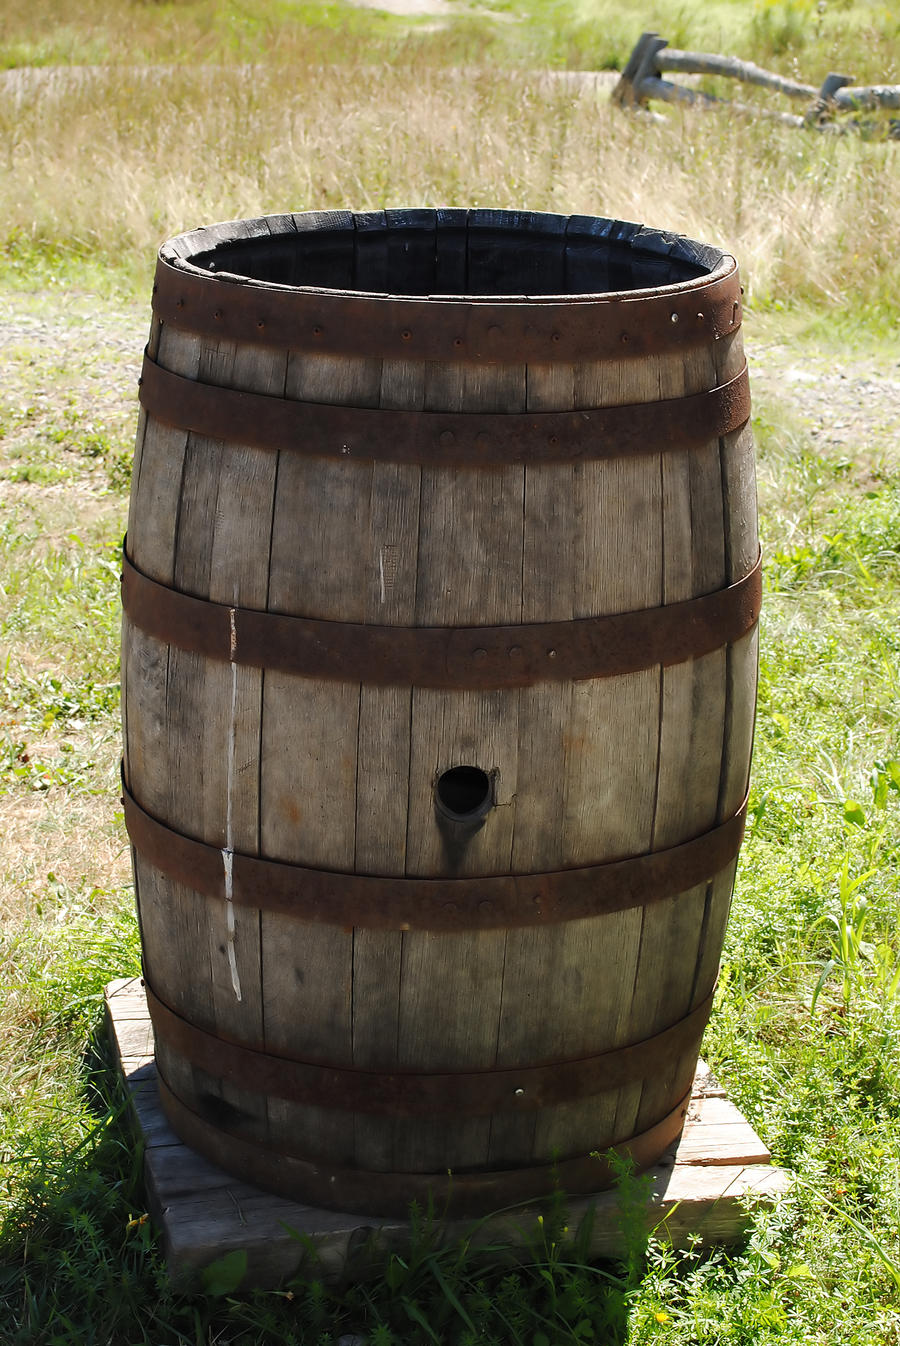 Barrel by LucieG-Stock